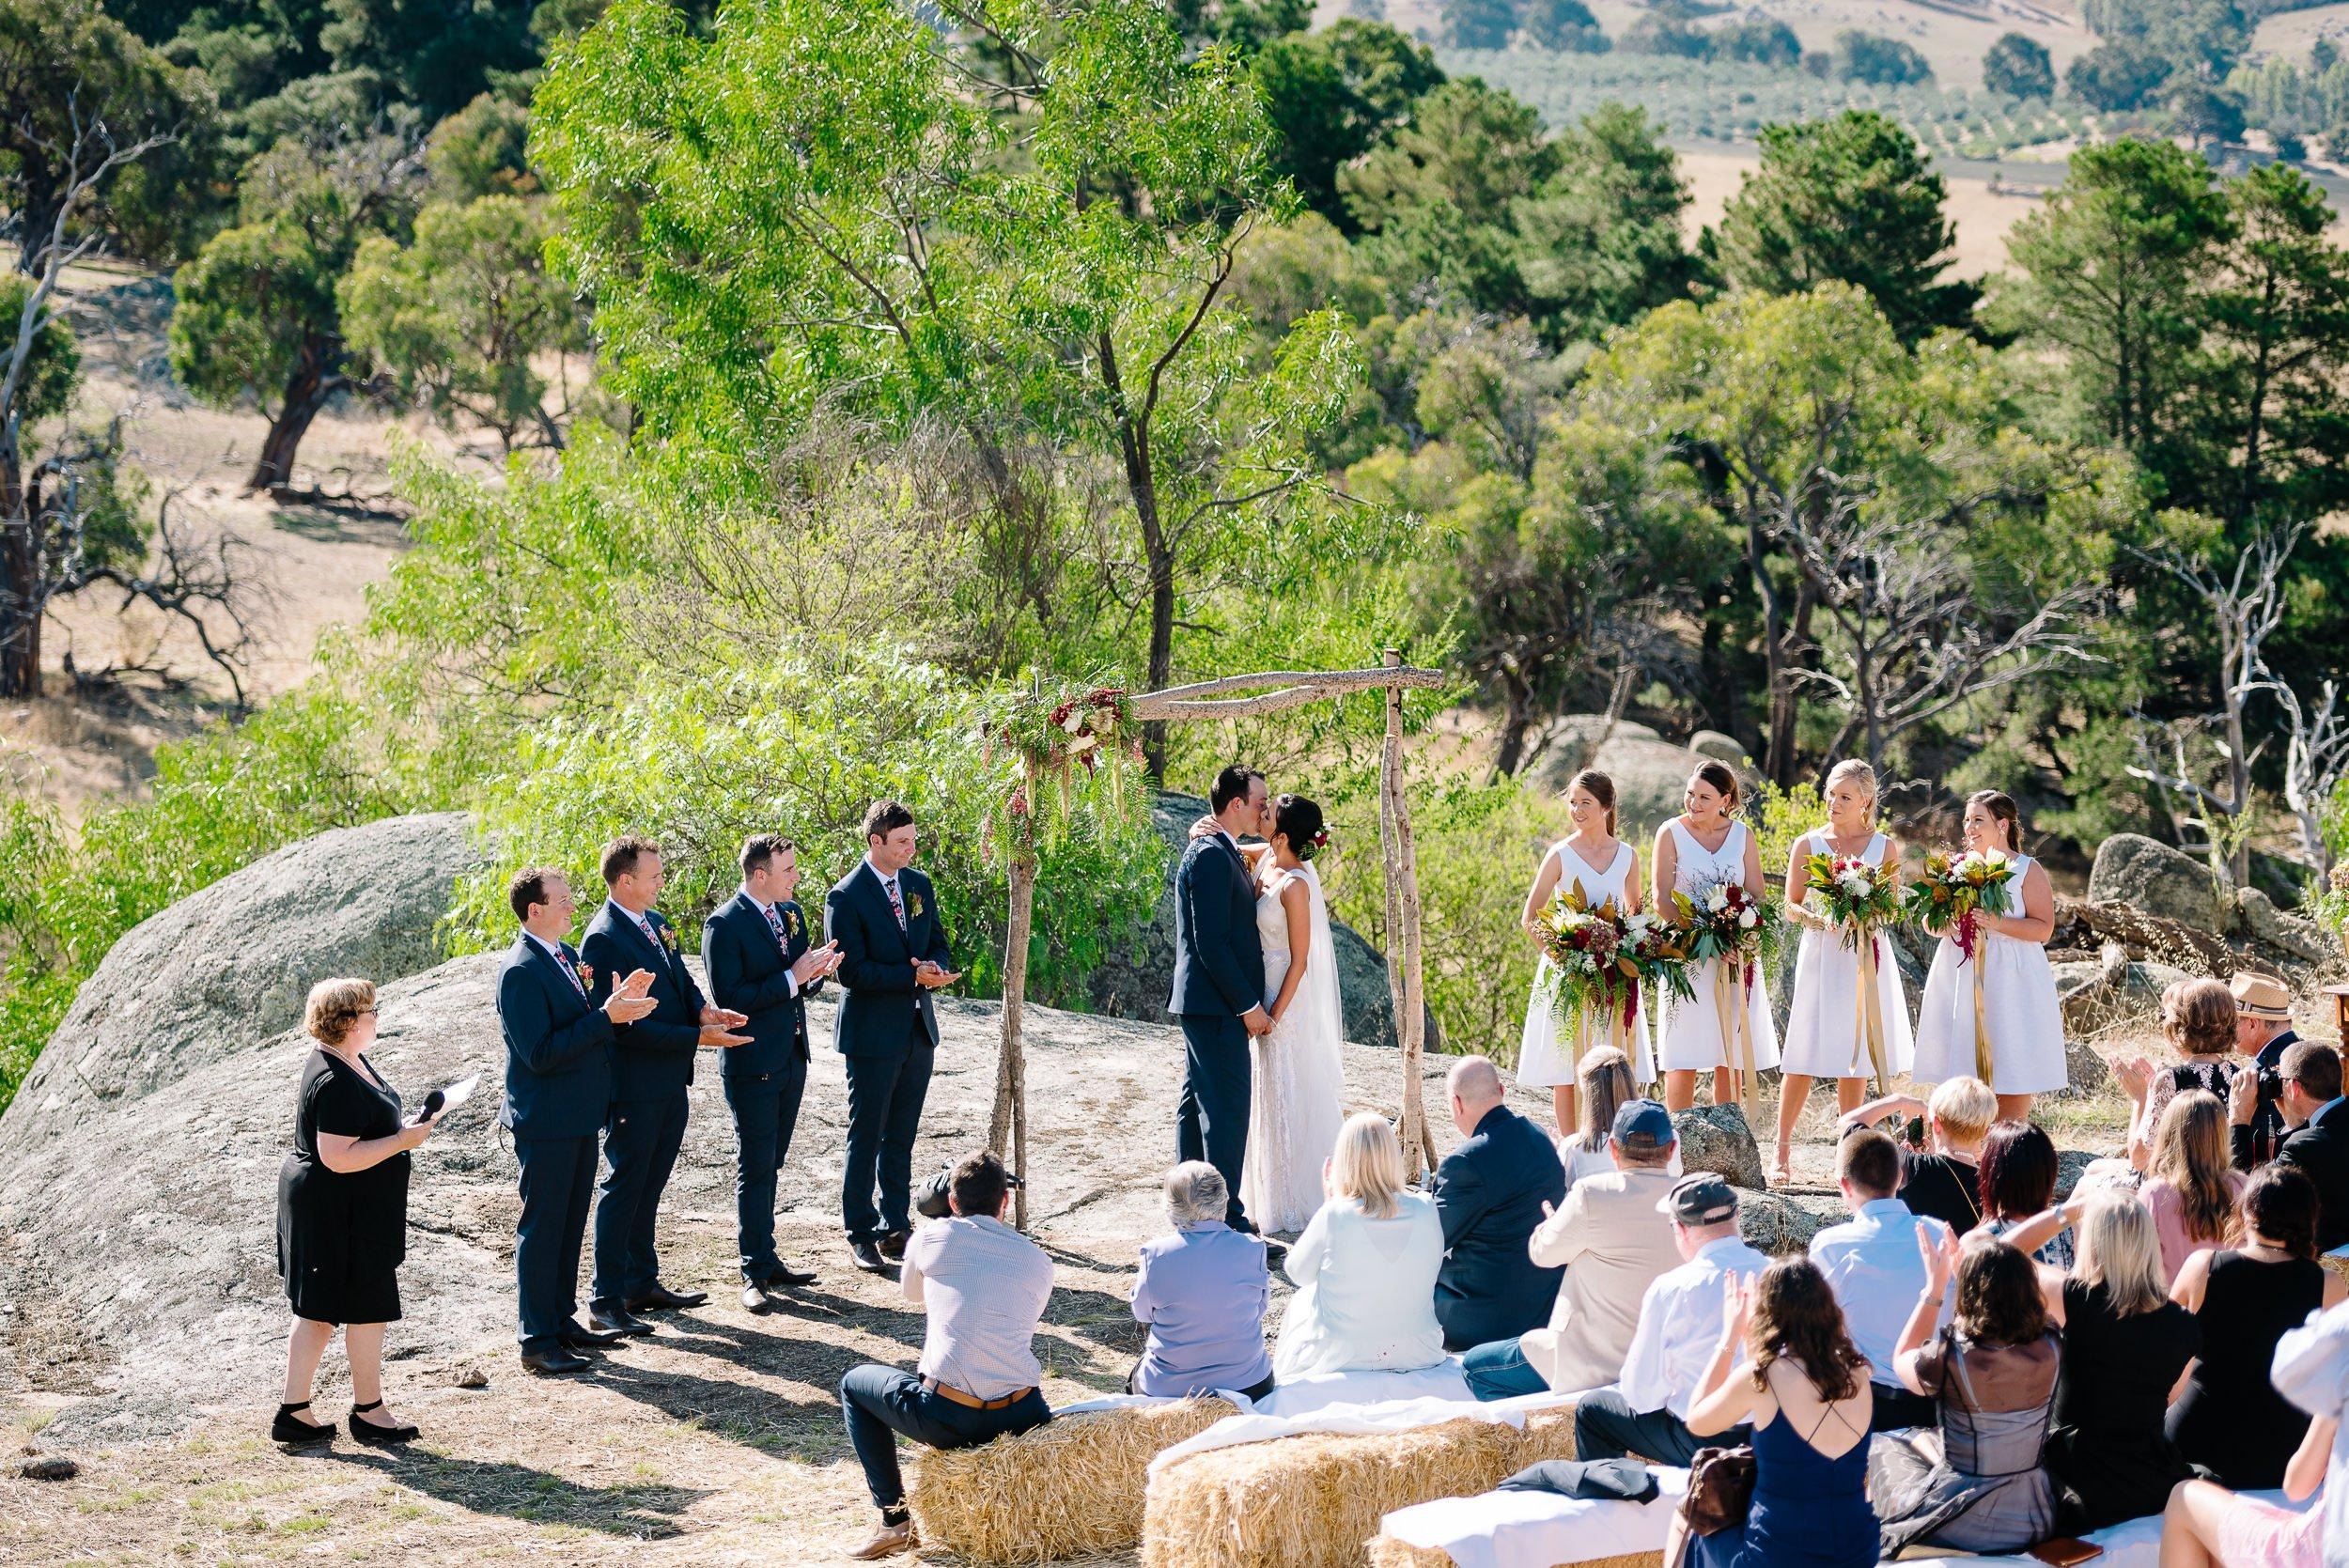 Bush weddings at Mimosa Glen